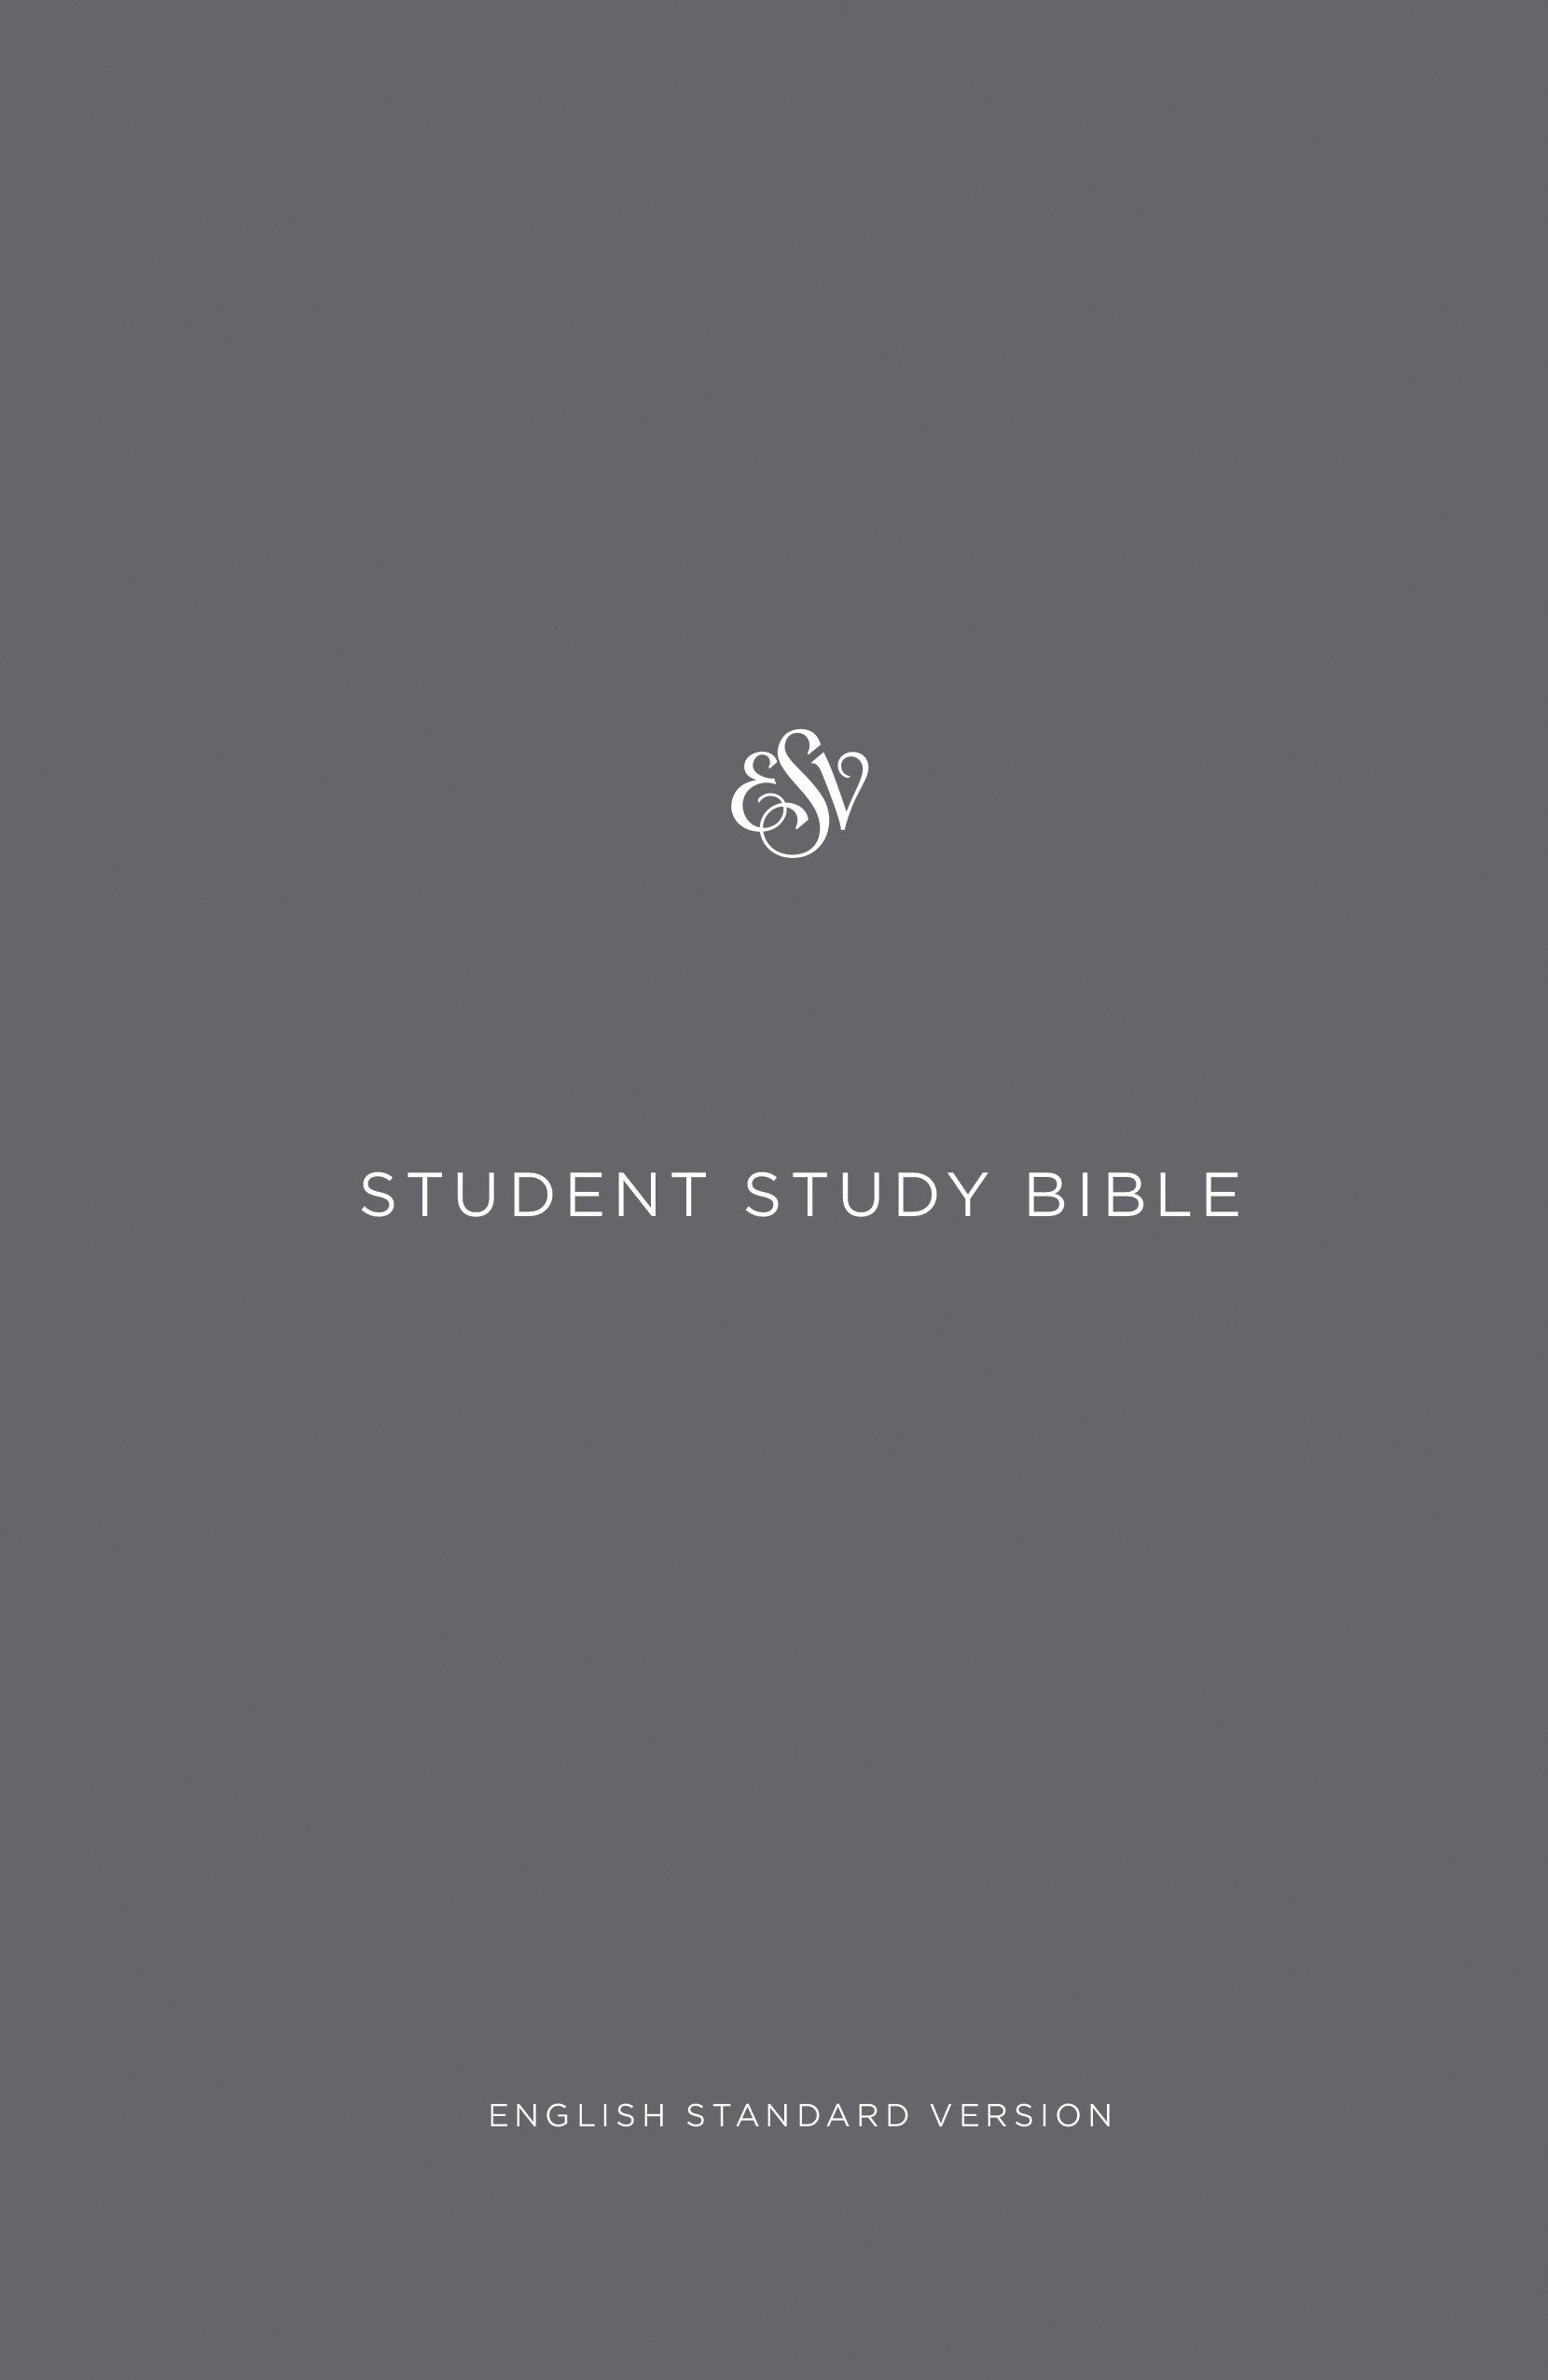 esv student study bible gray